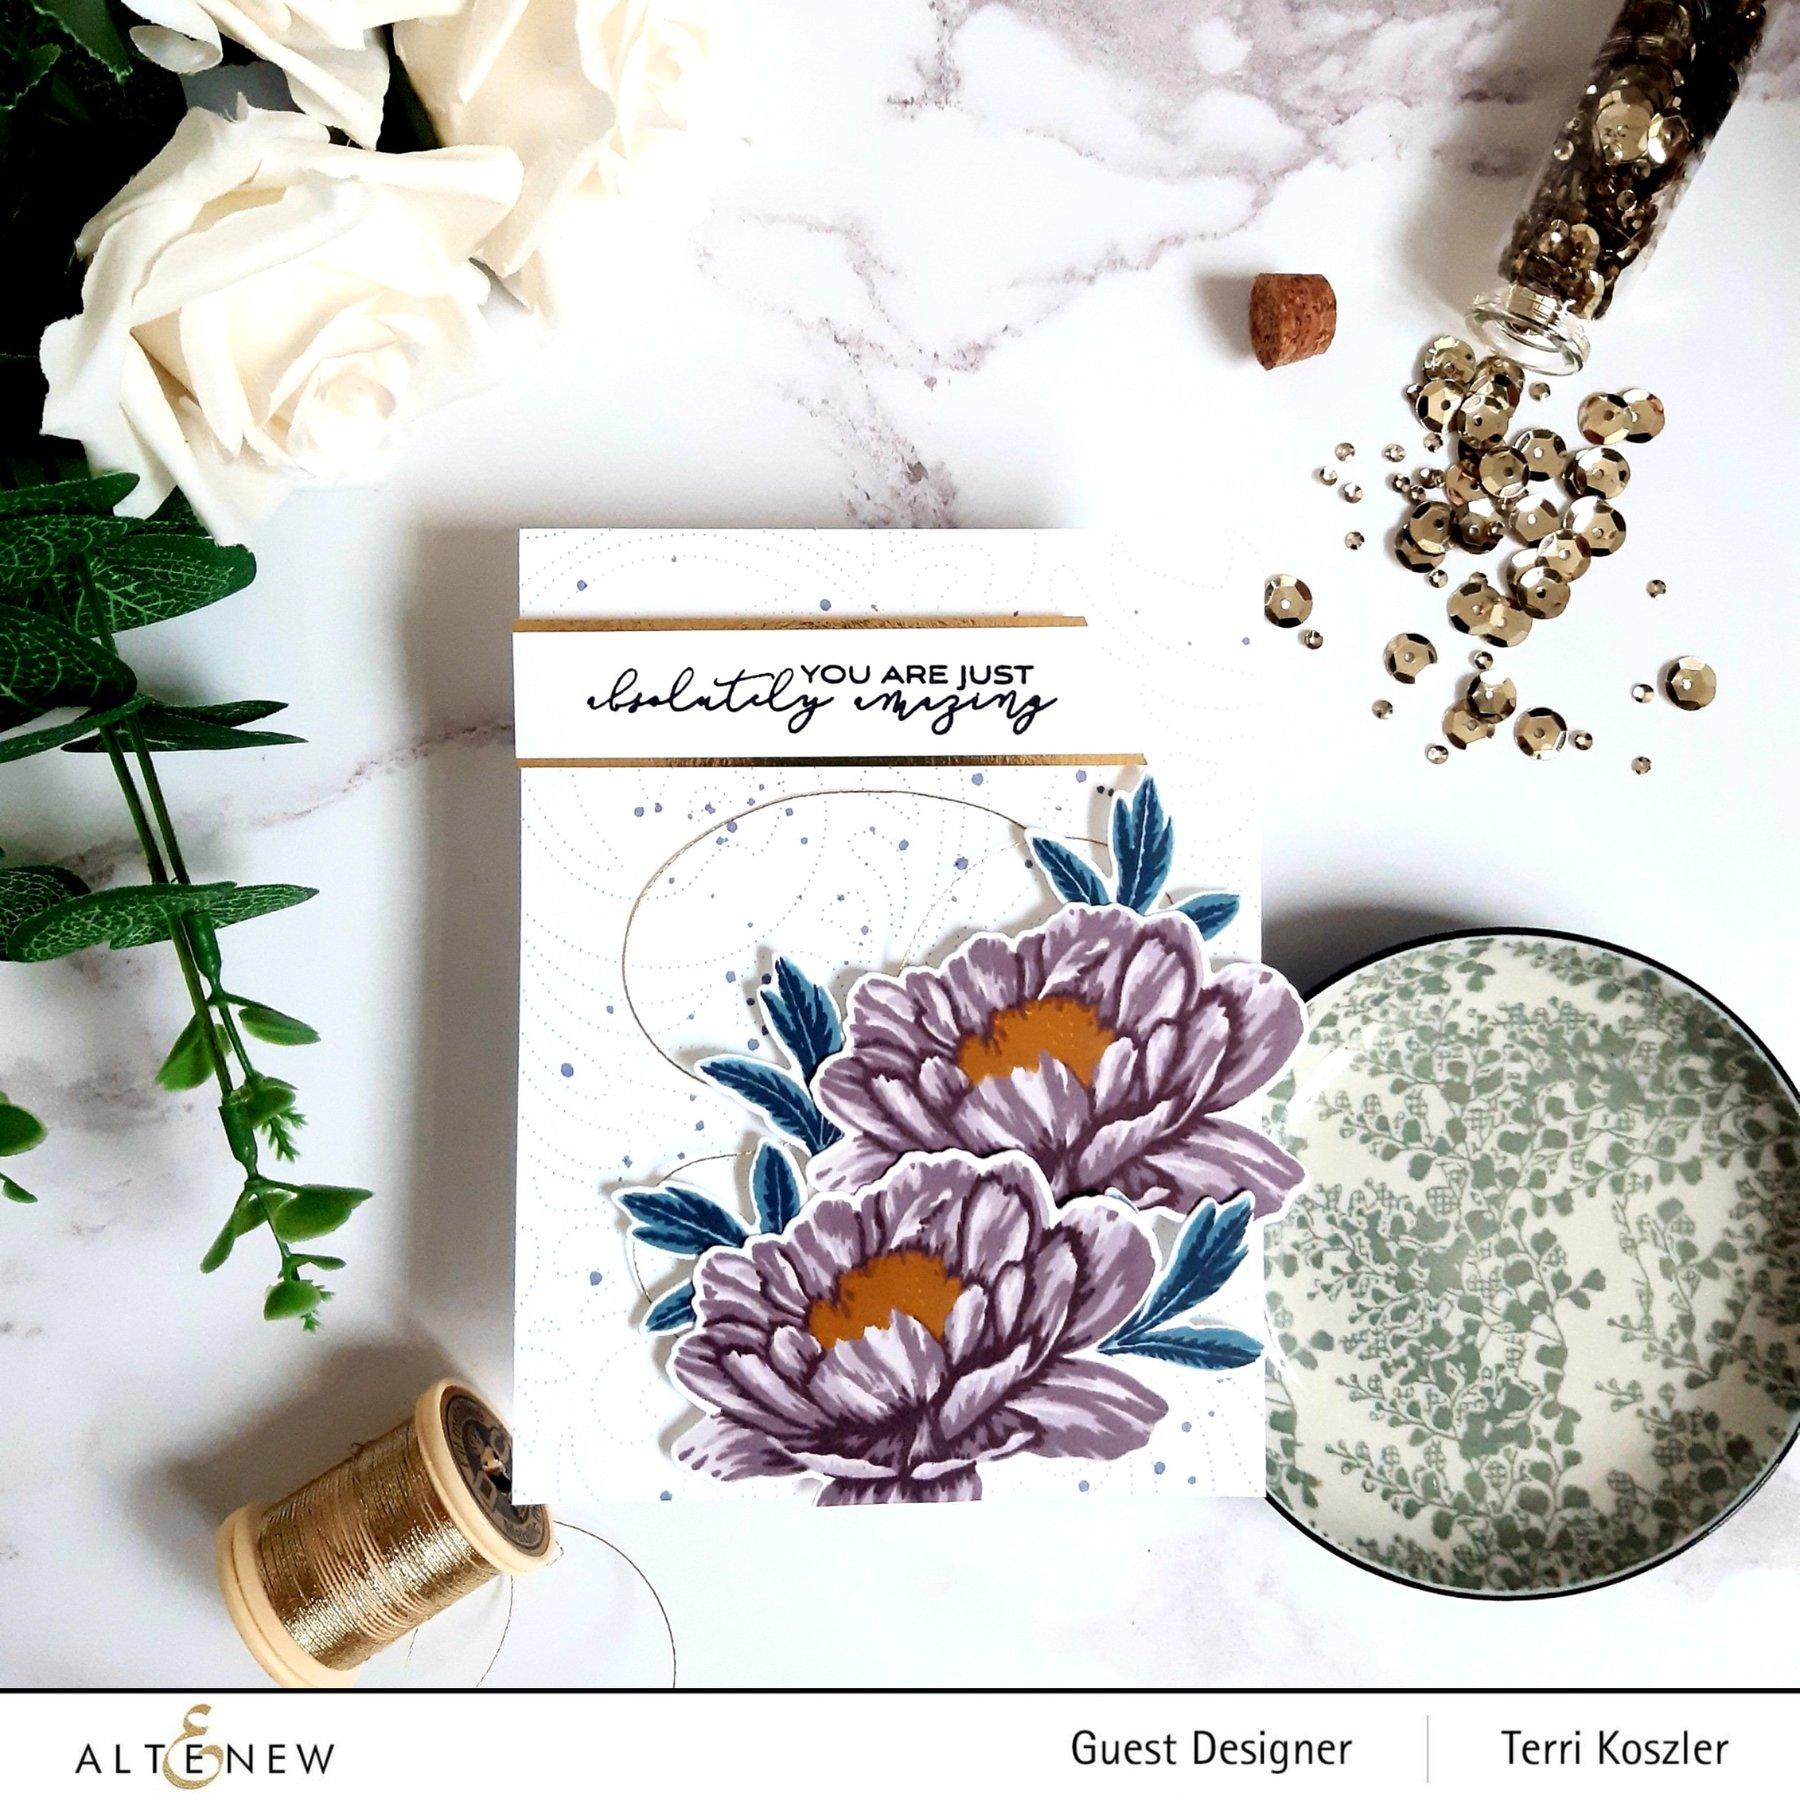 Altenew - Build-A-Flower: Parrot Tulips Layering Stamp & Die Set